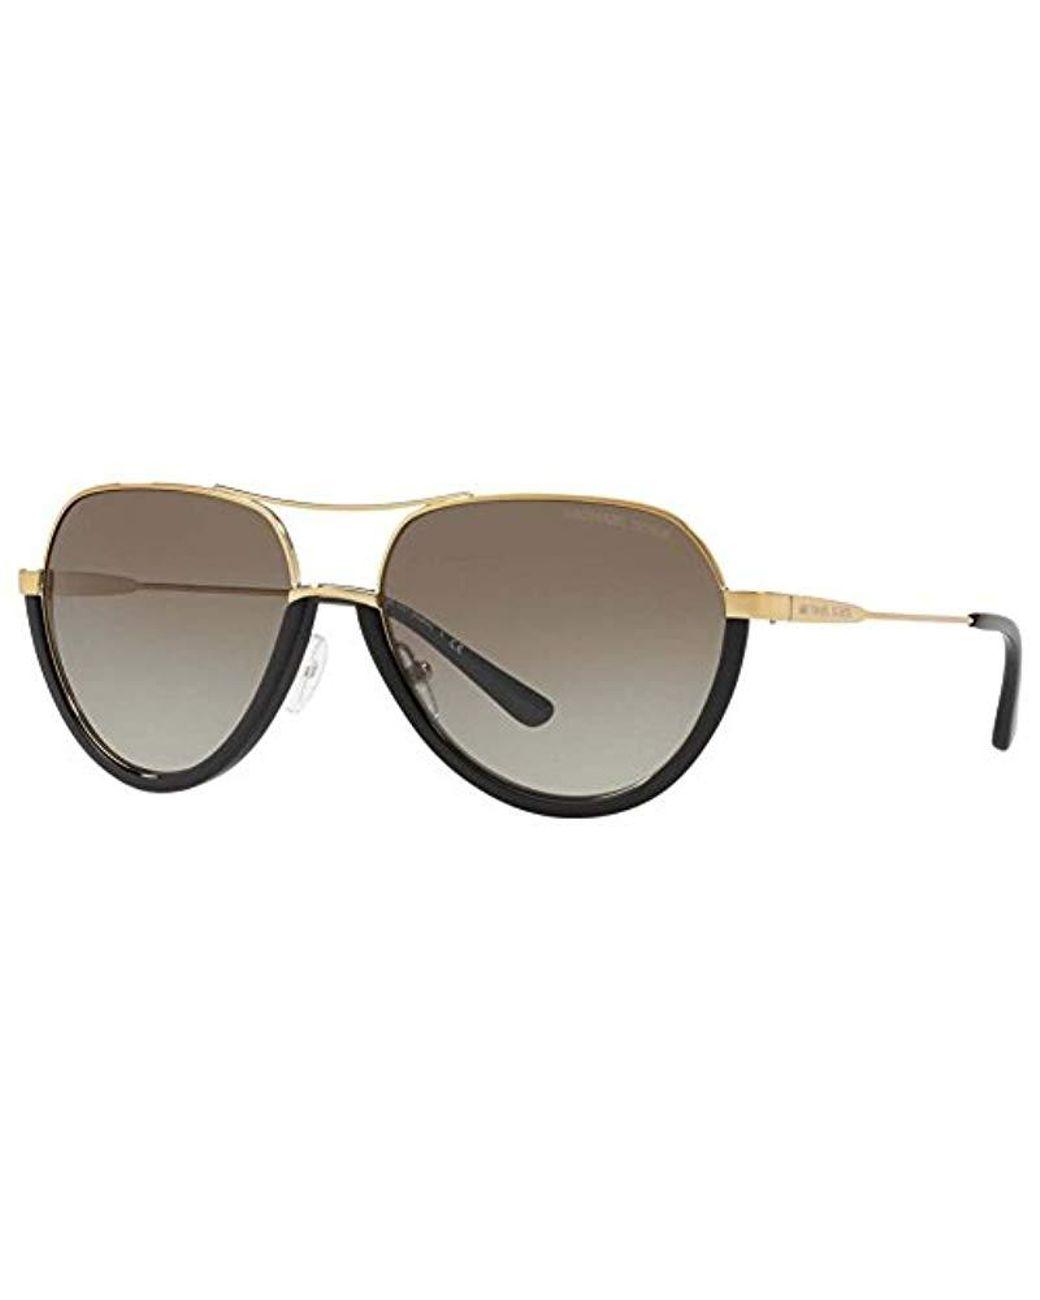 24010699e950 Michael Kors. Women's Metallic 1031 Austin 10248e 58 Rectangular Sunglasses  ...